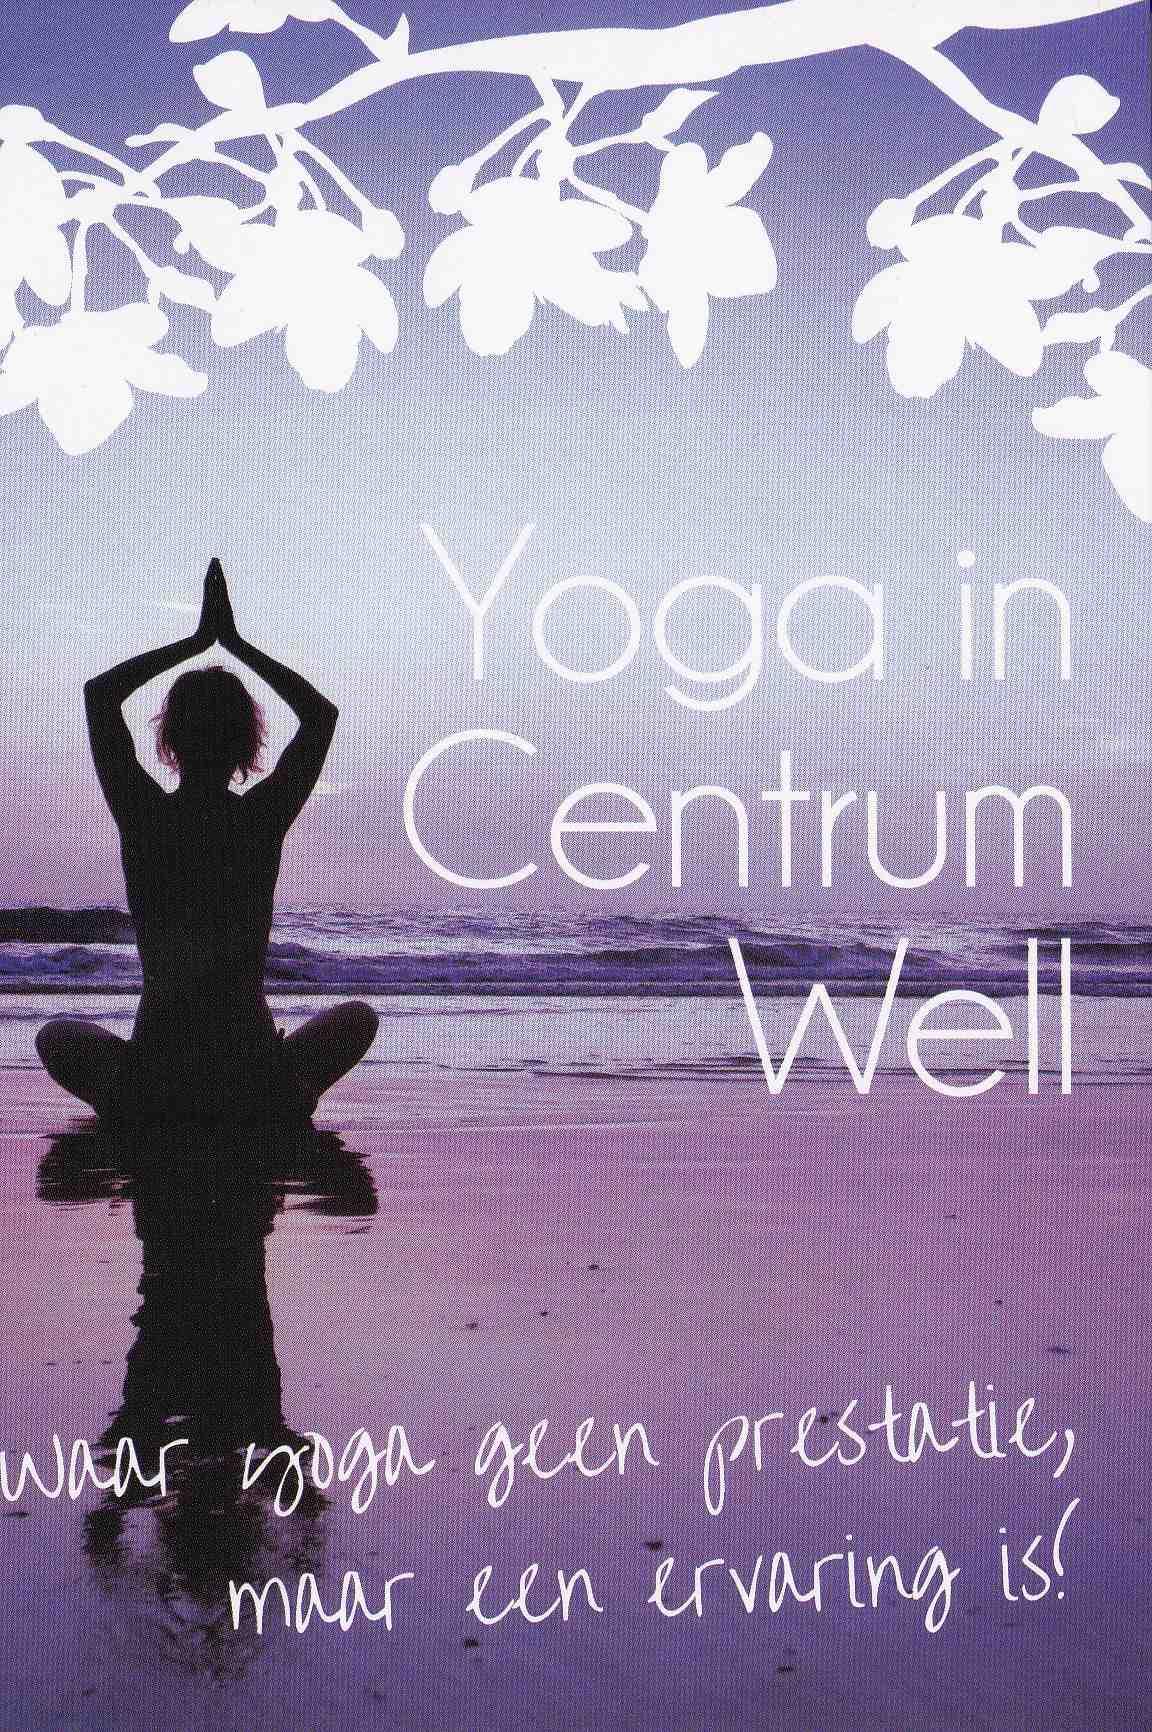 Yoga in centrum well